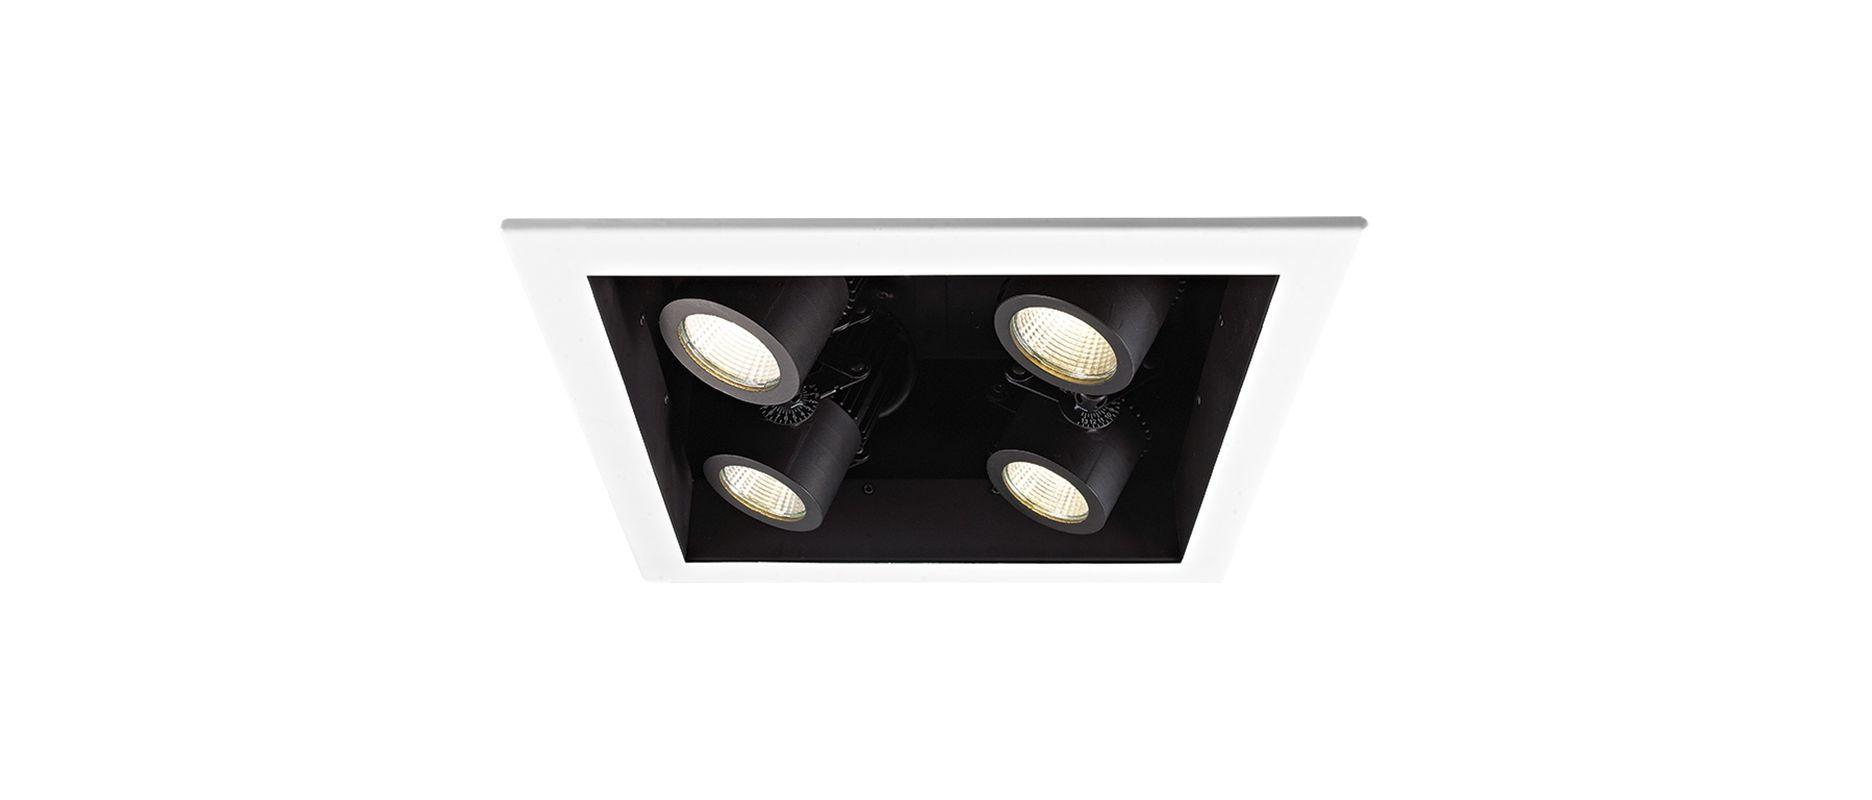 WAC Lighting MT-4LD226N-S927 4 Light Energy Star 2700K High Output LED